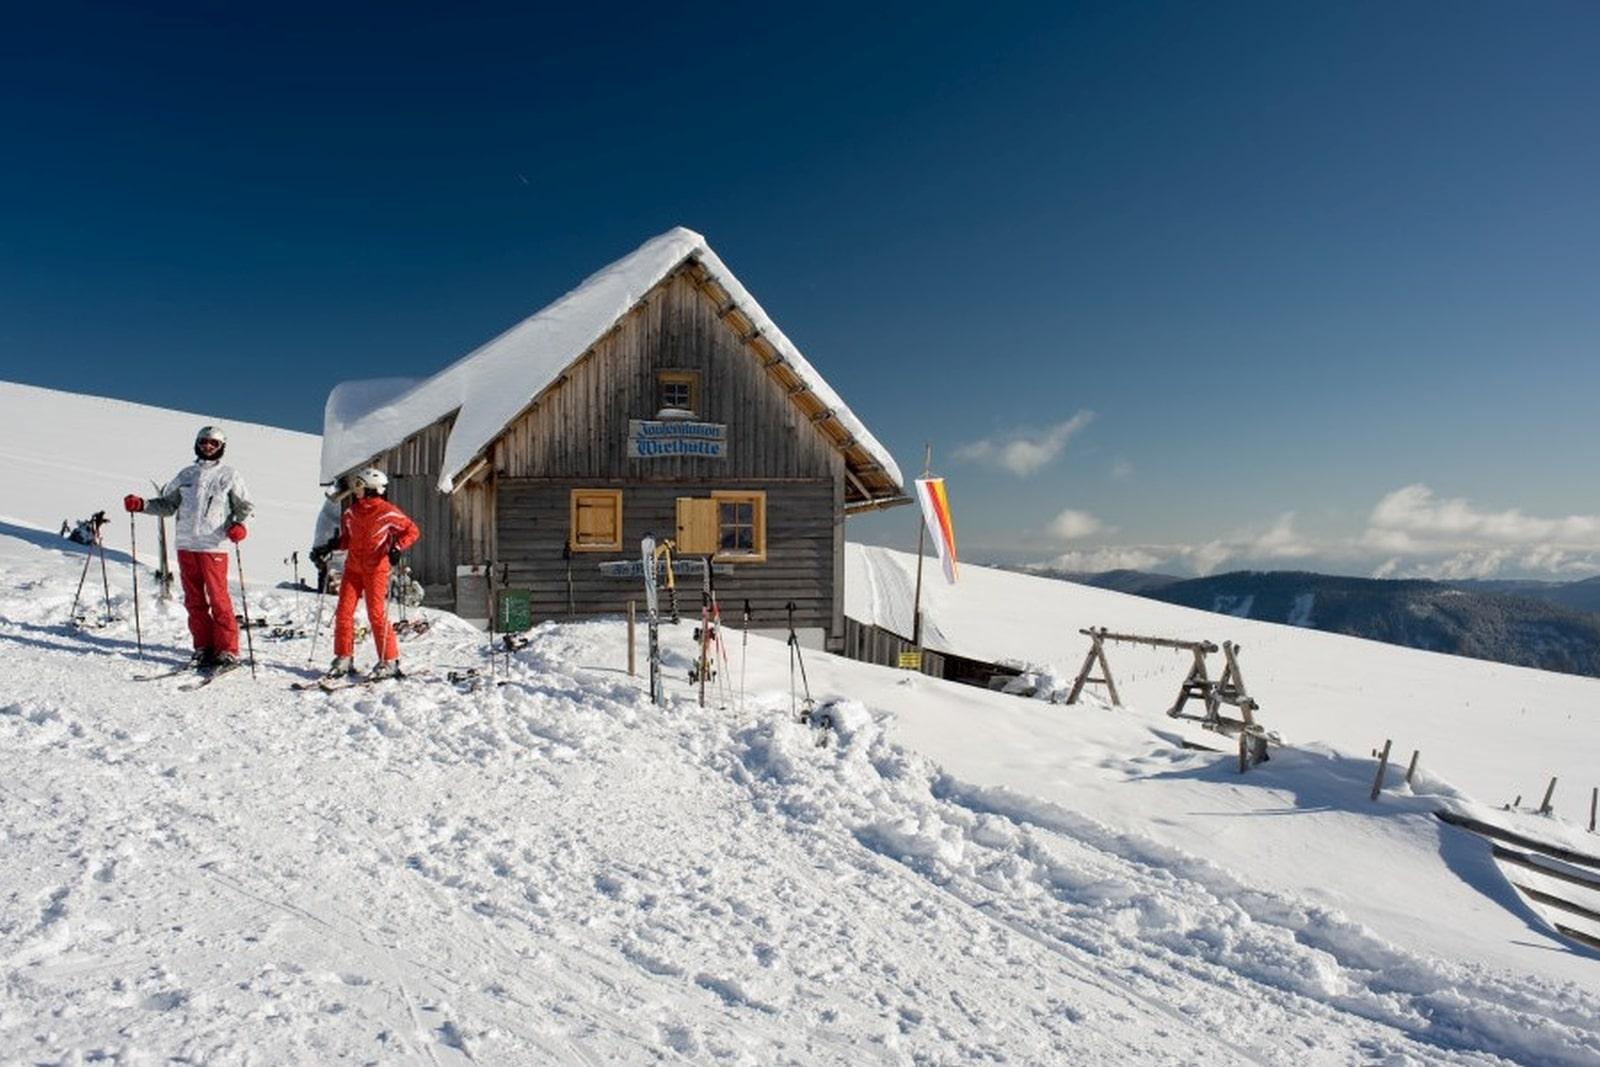 Heidi-Chalet-Falkert-Heidialm-Restaurant-Falkert-Wirtalm-Huette-Winter